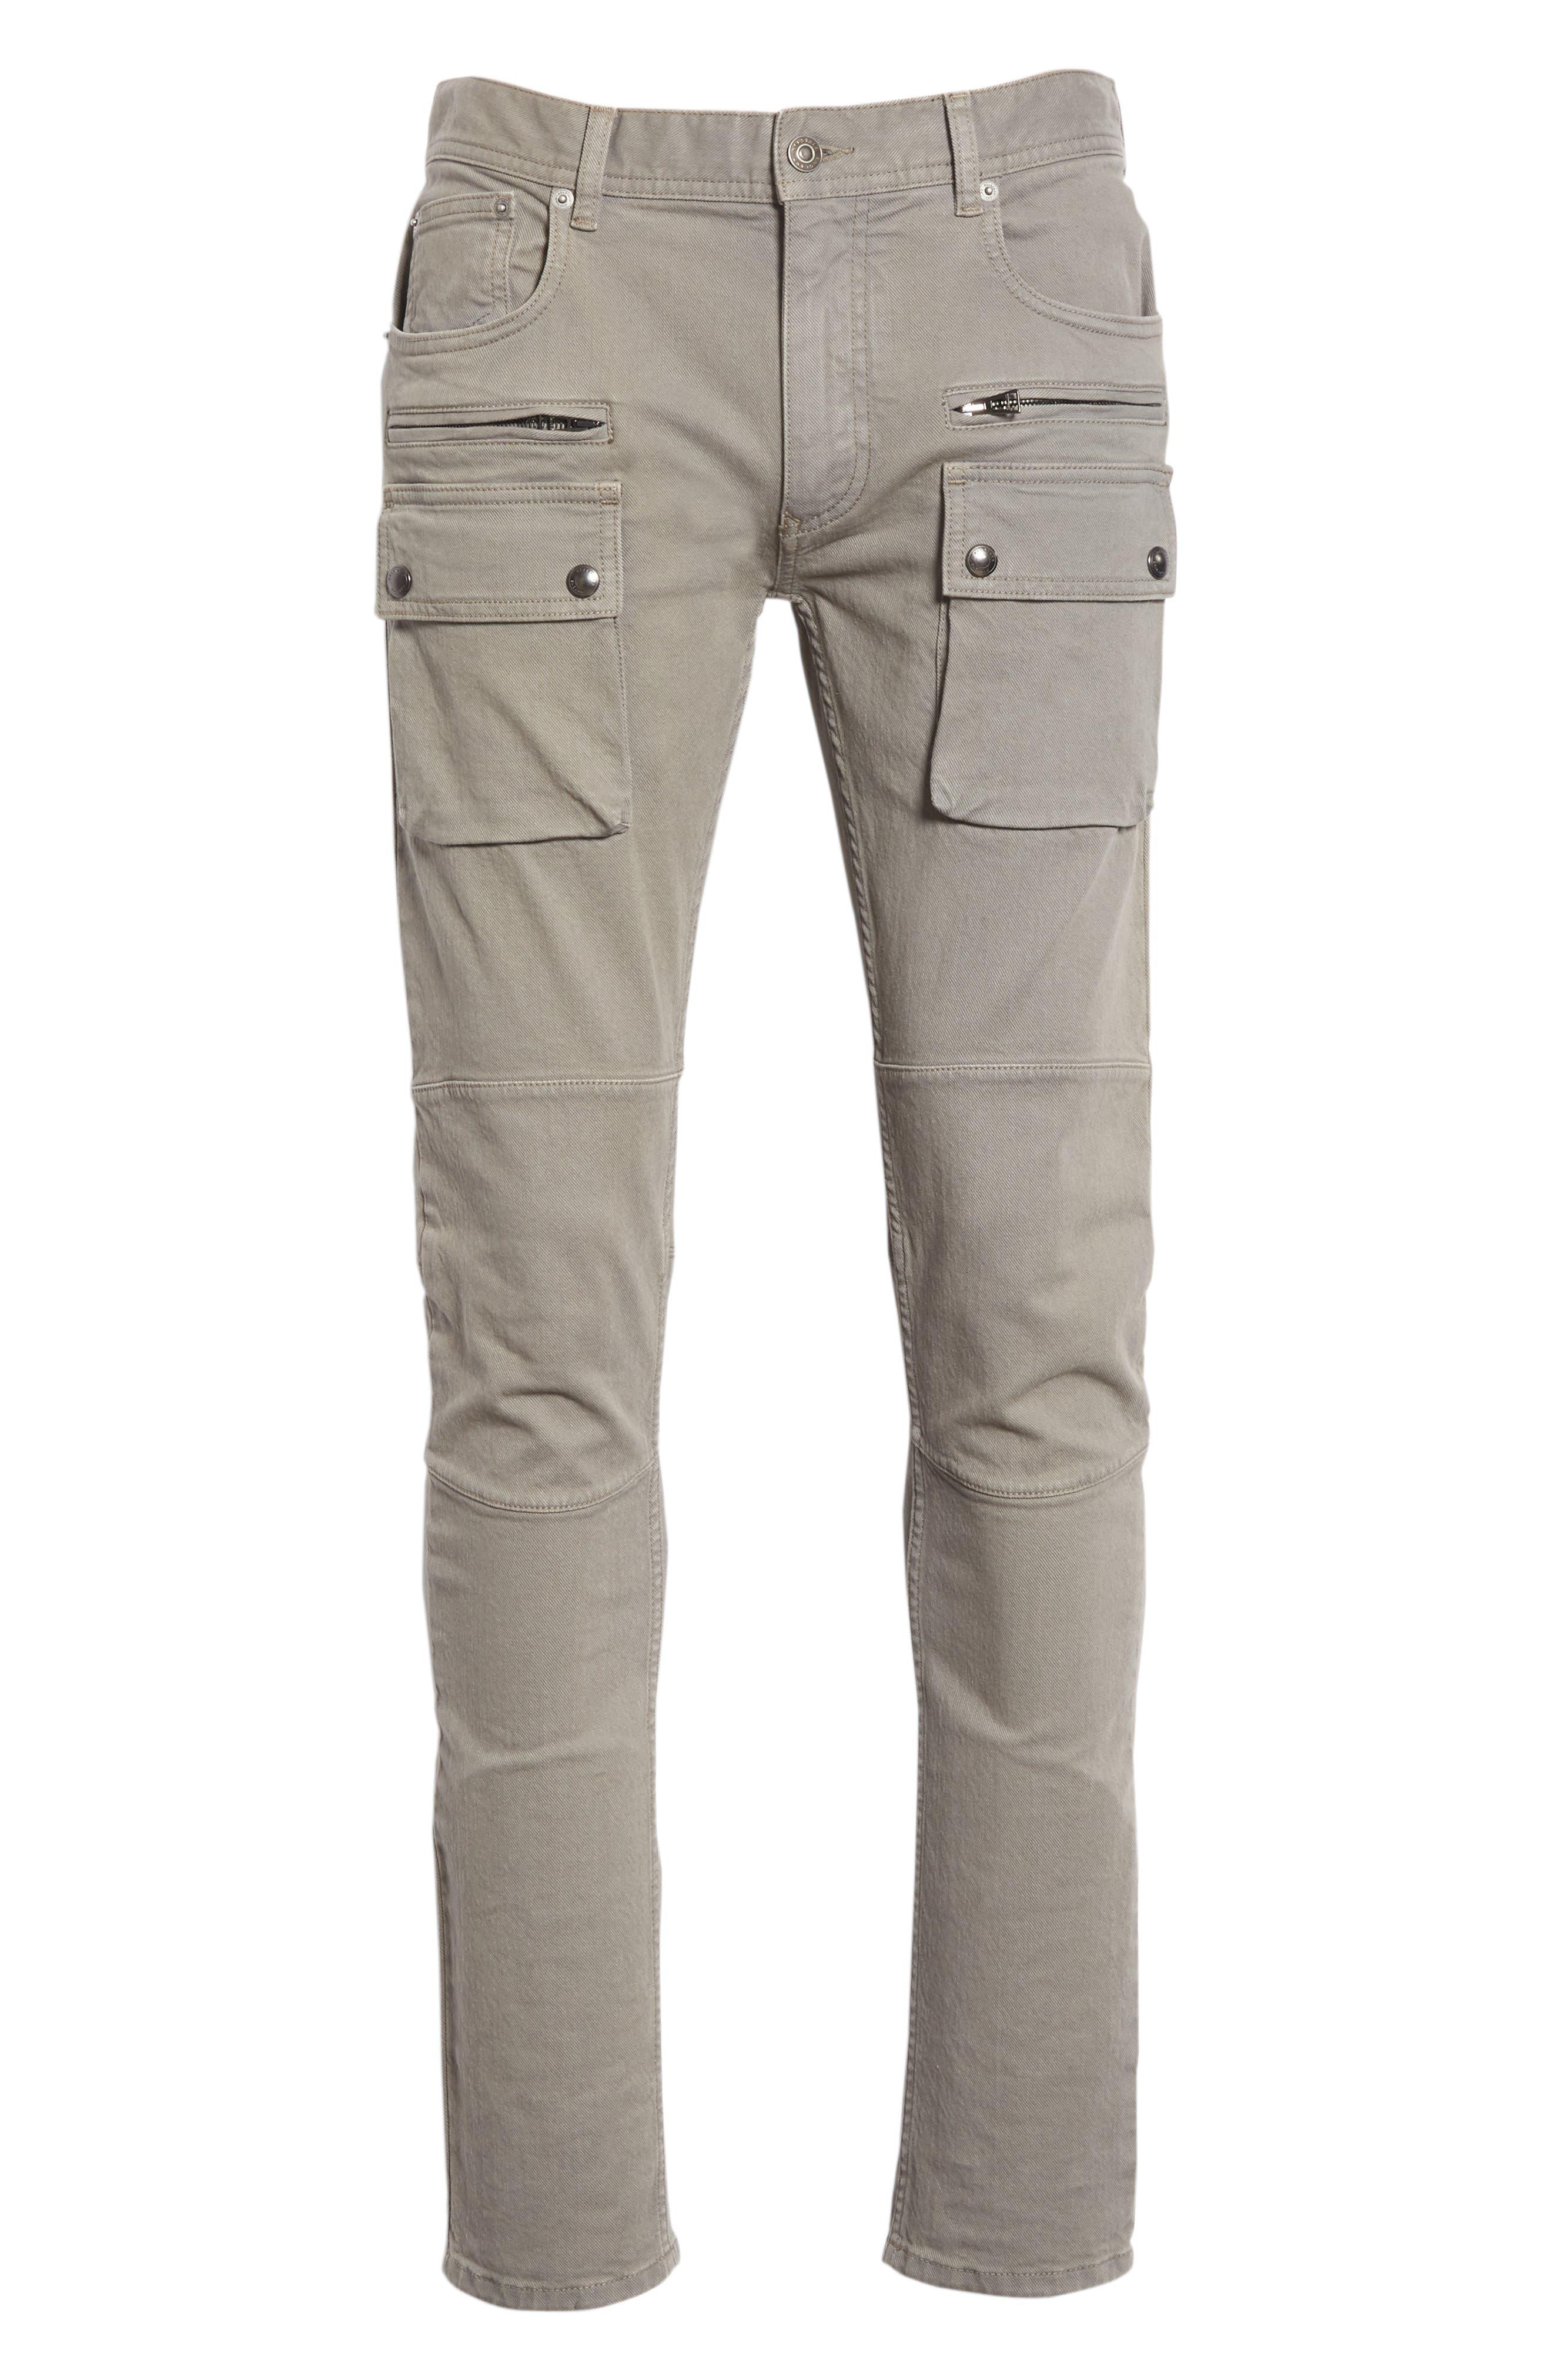 Polmont Cargo Denim Jeans,                             Alternate thumbnail 6, color,                             SMOKE GREY